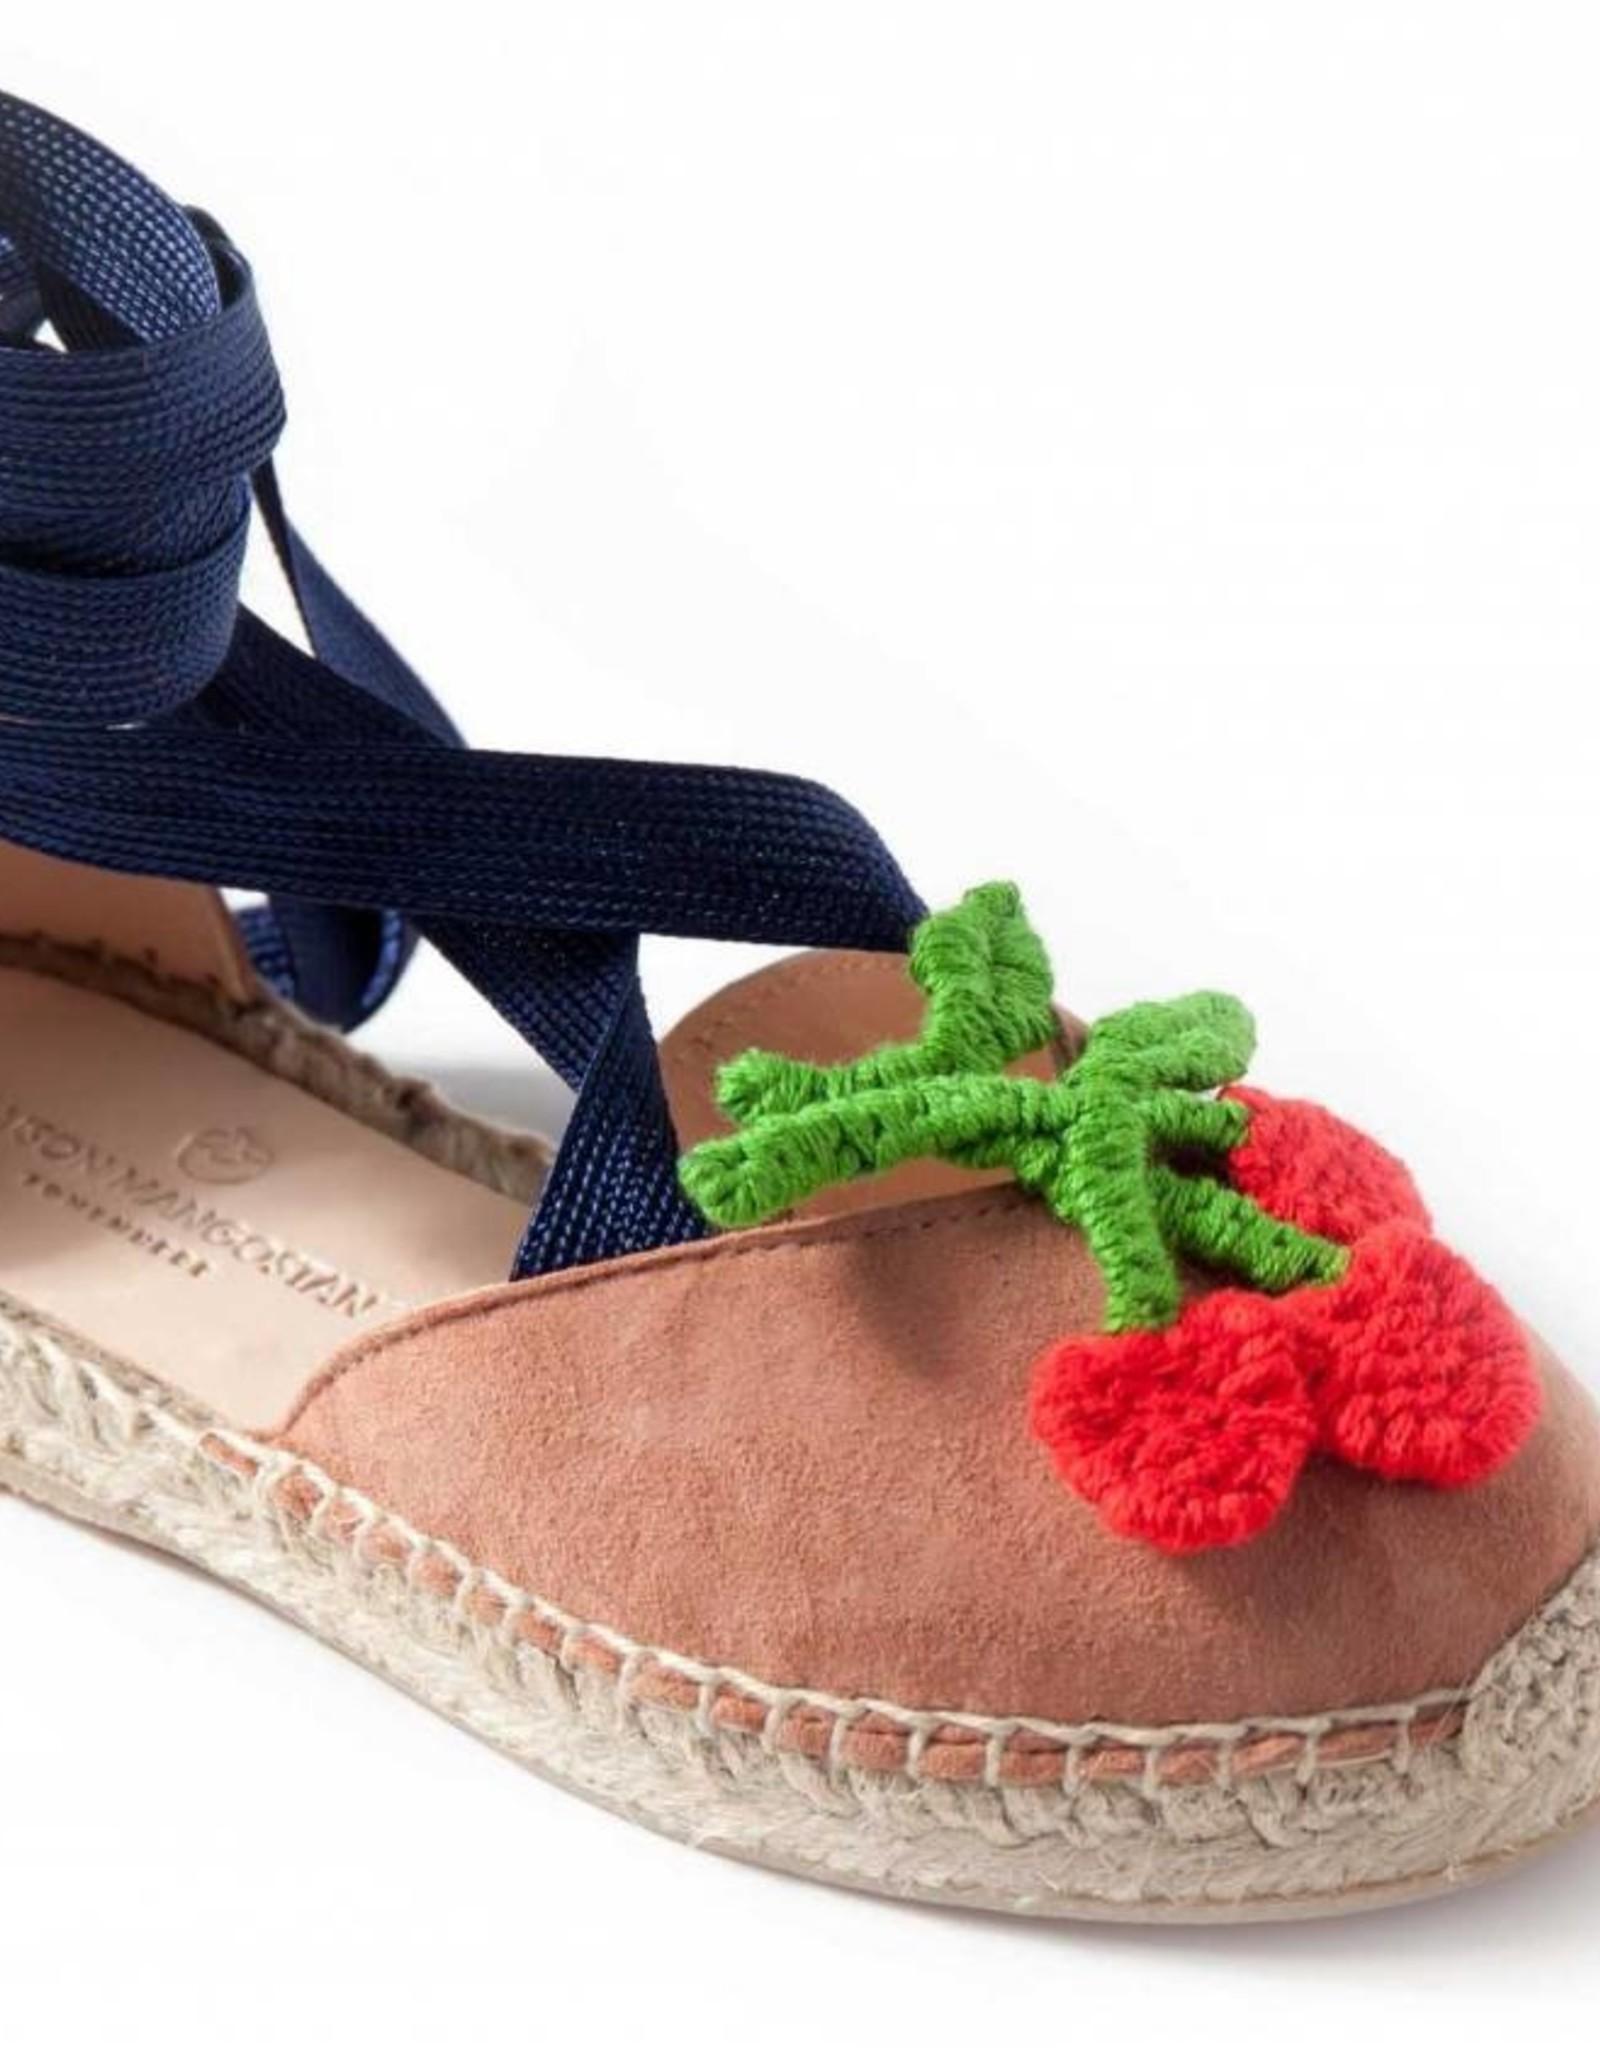 Maison Mangostan Mini Macedonia cherry sandals